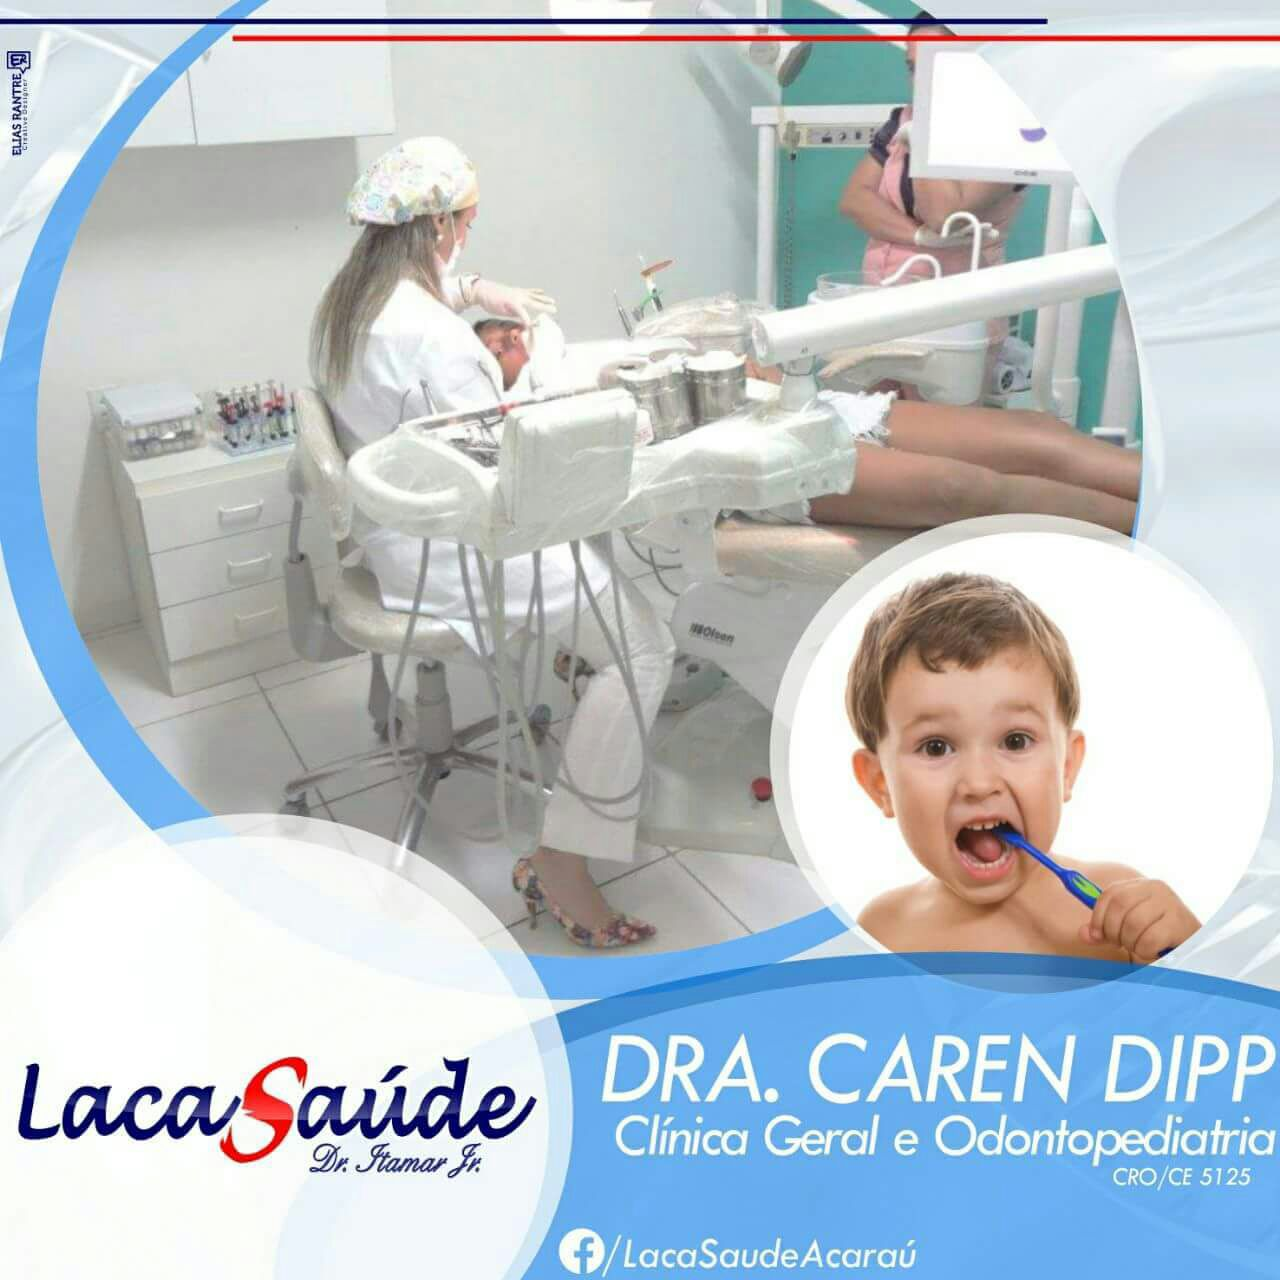 Dentista Acaraú